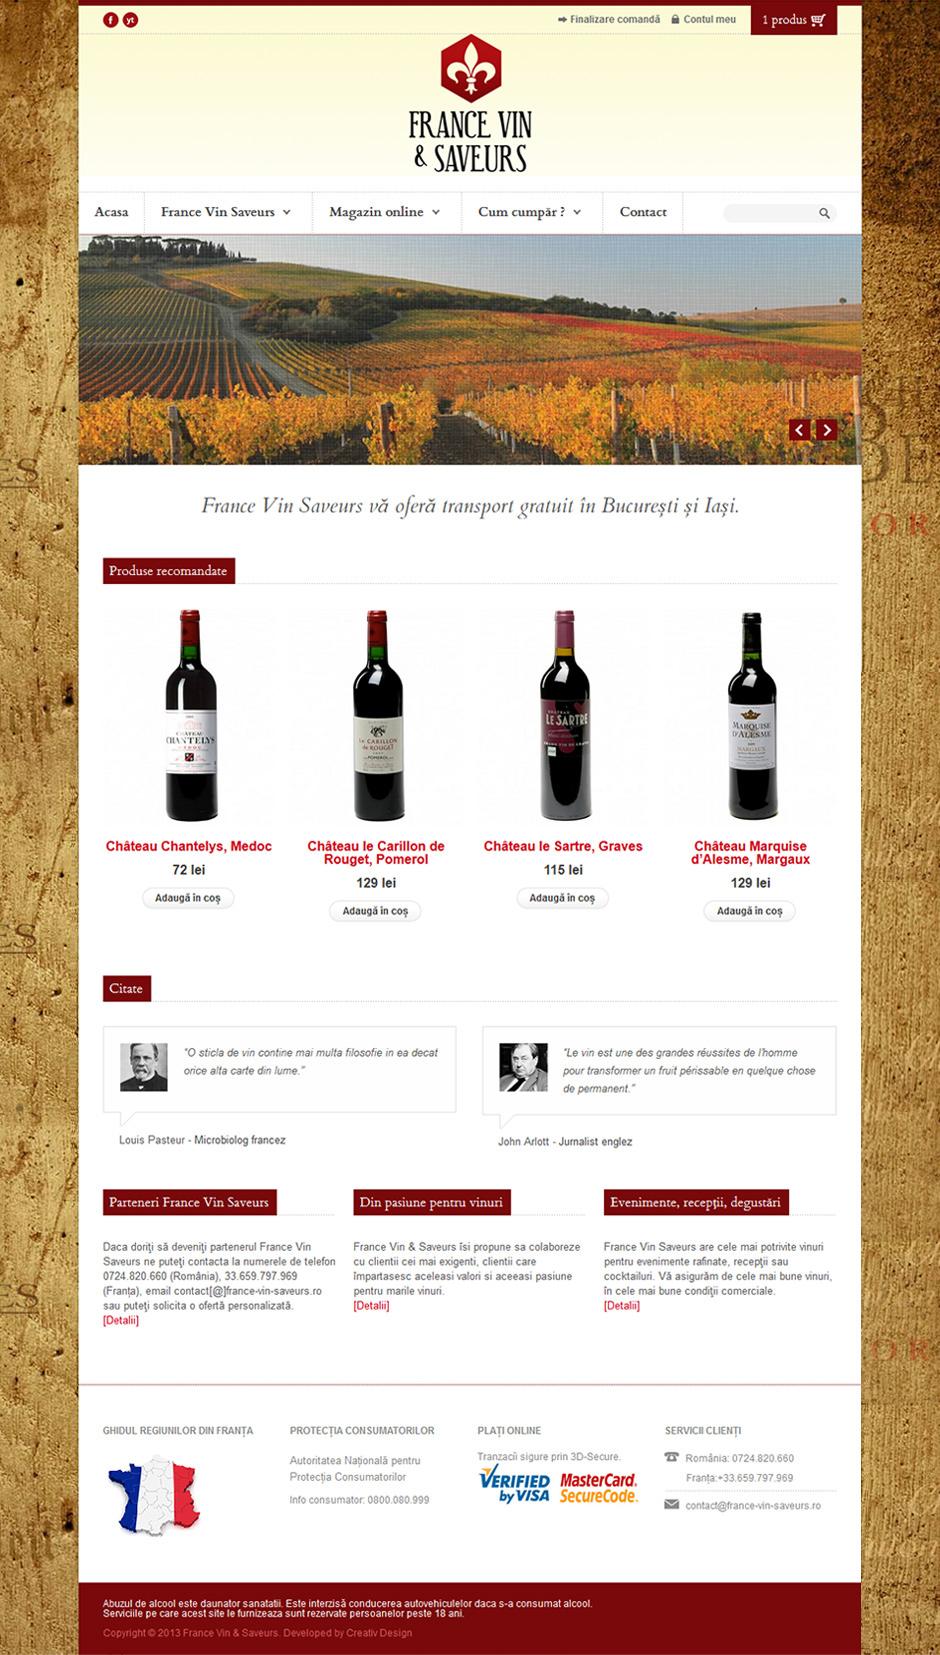 france-vin-saveurs-1